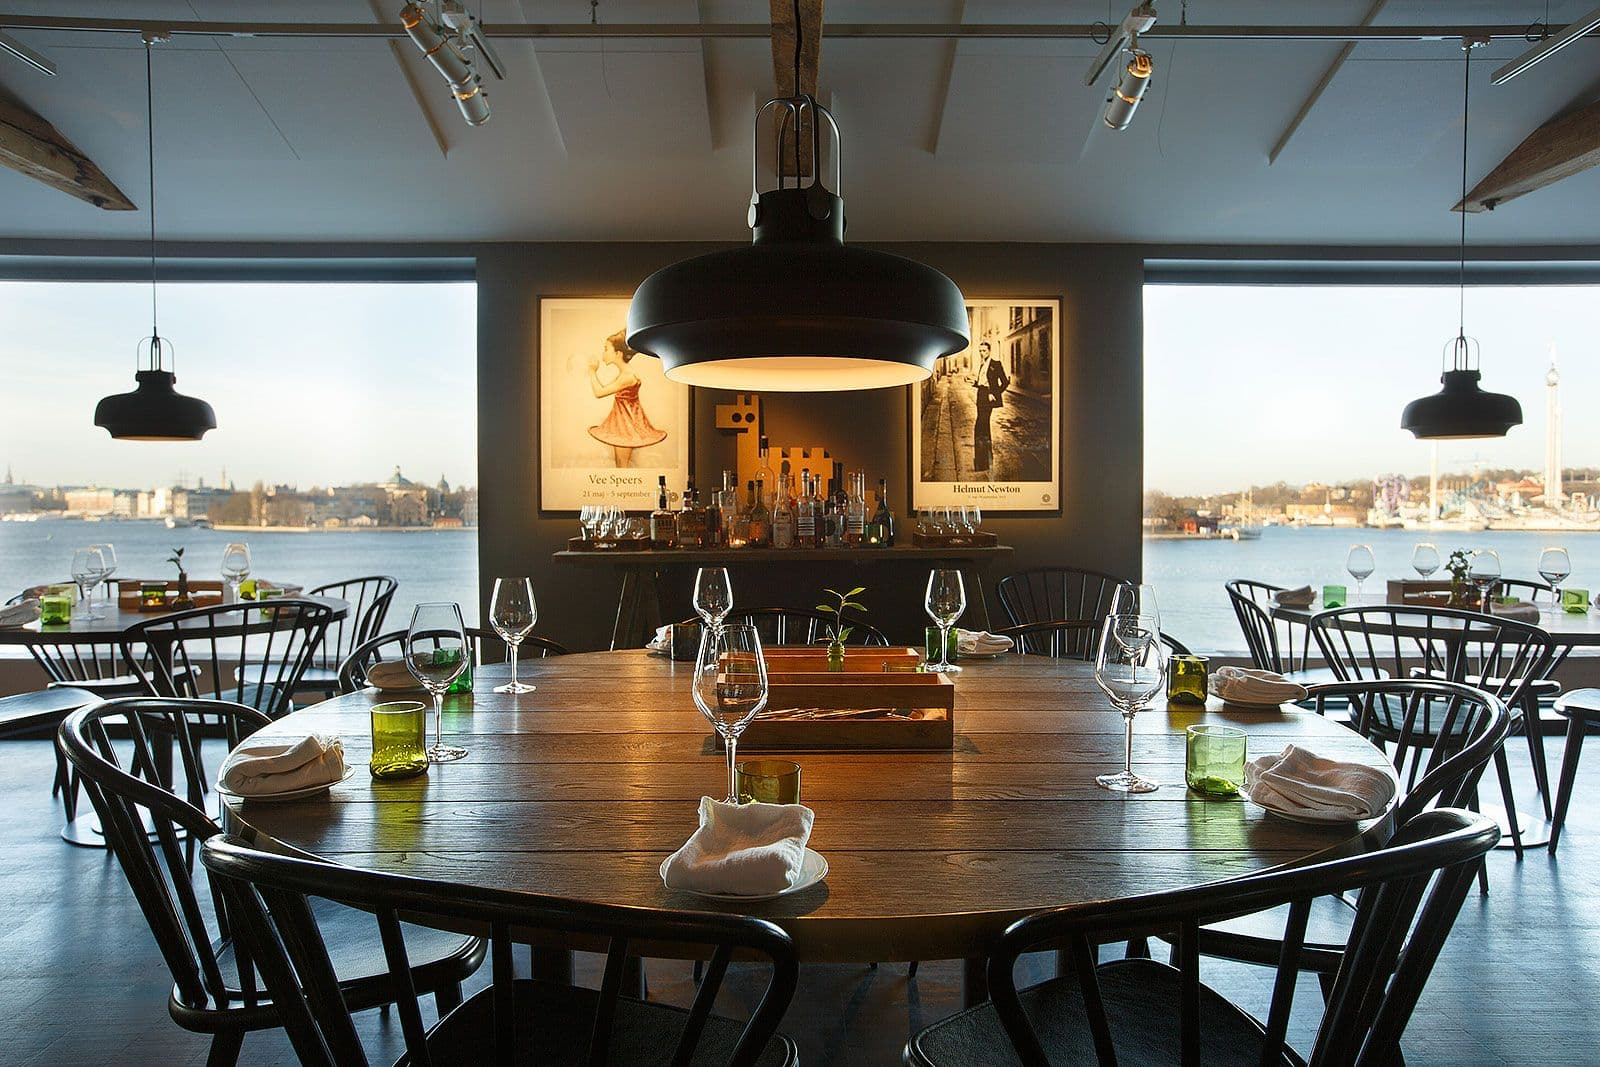 restaurang malmskillnadsgatan stockholm